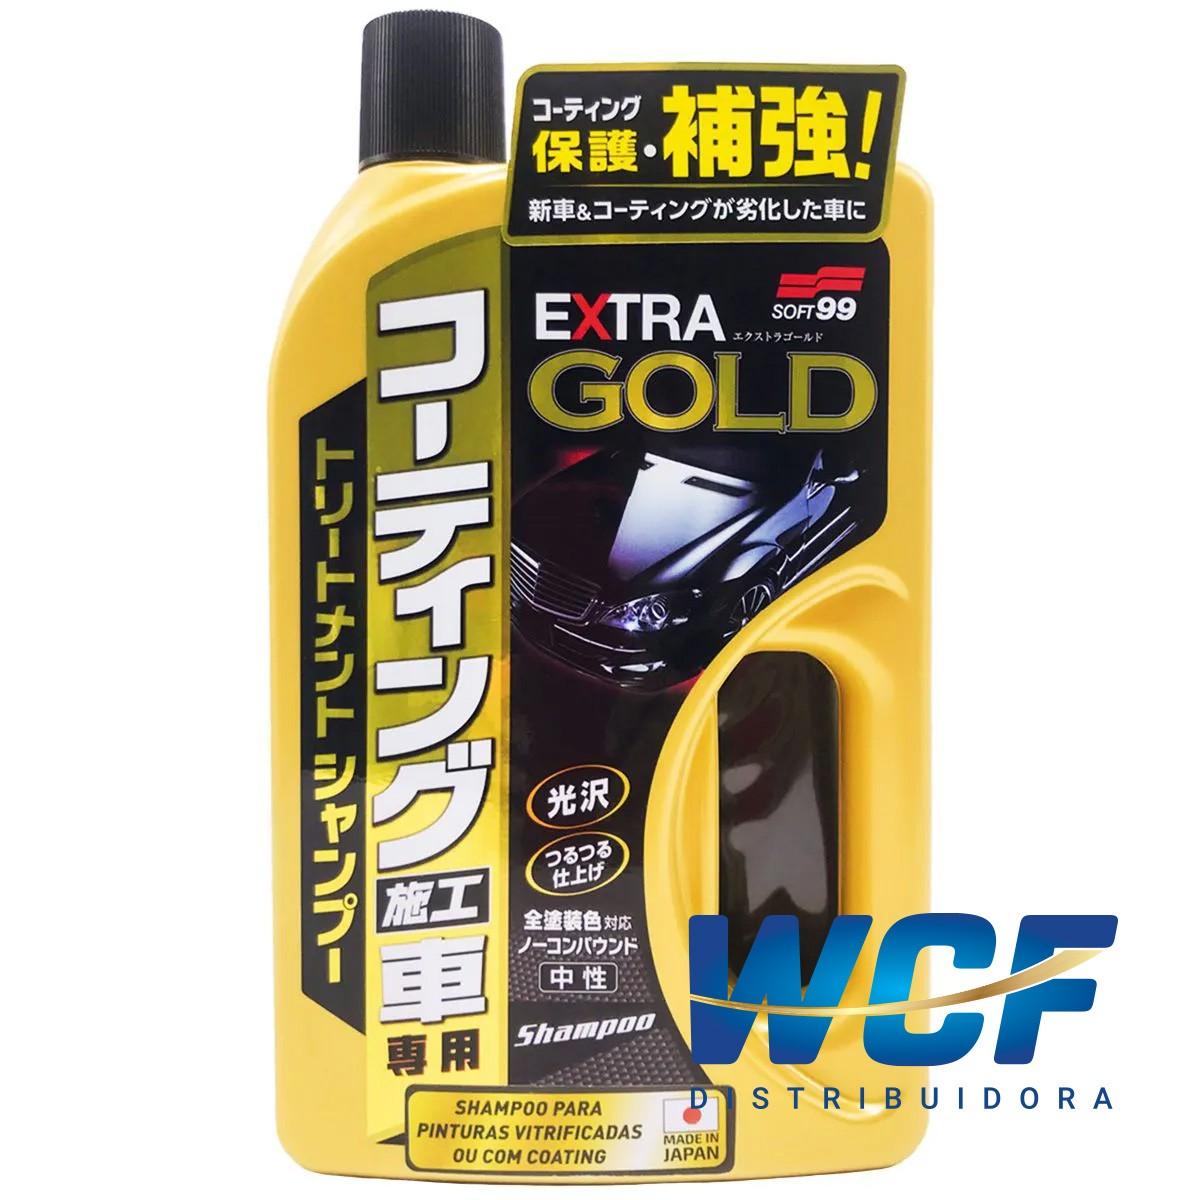 SOFT99 EXTRA GOLD SHAMPOO CARROS COATING